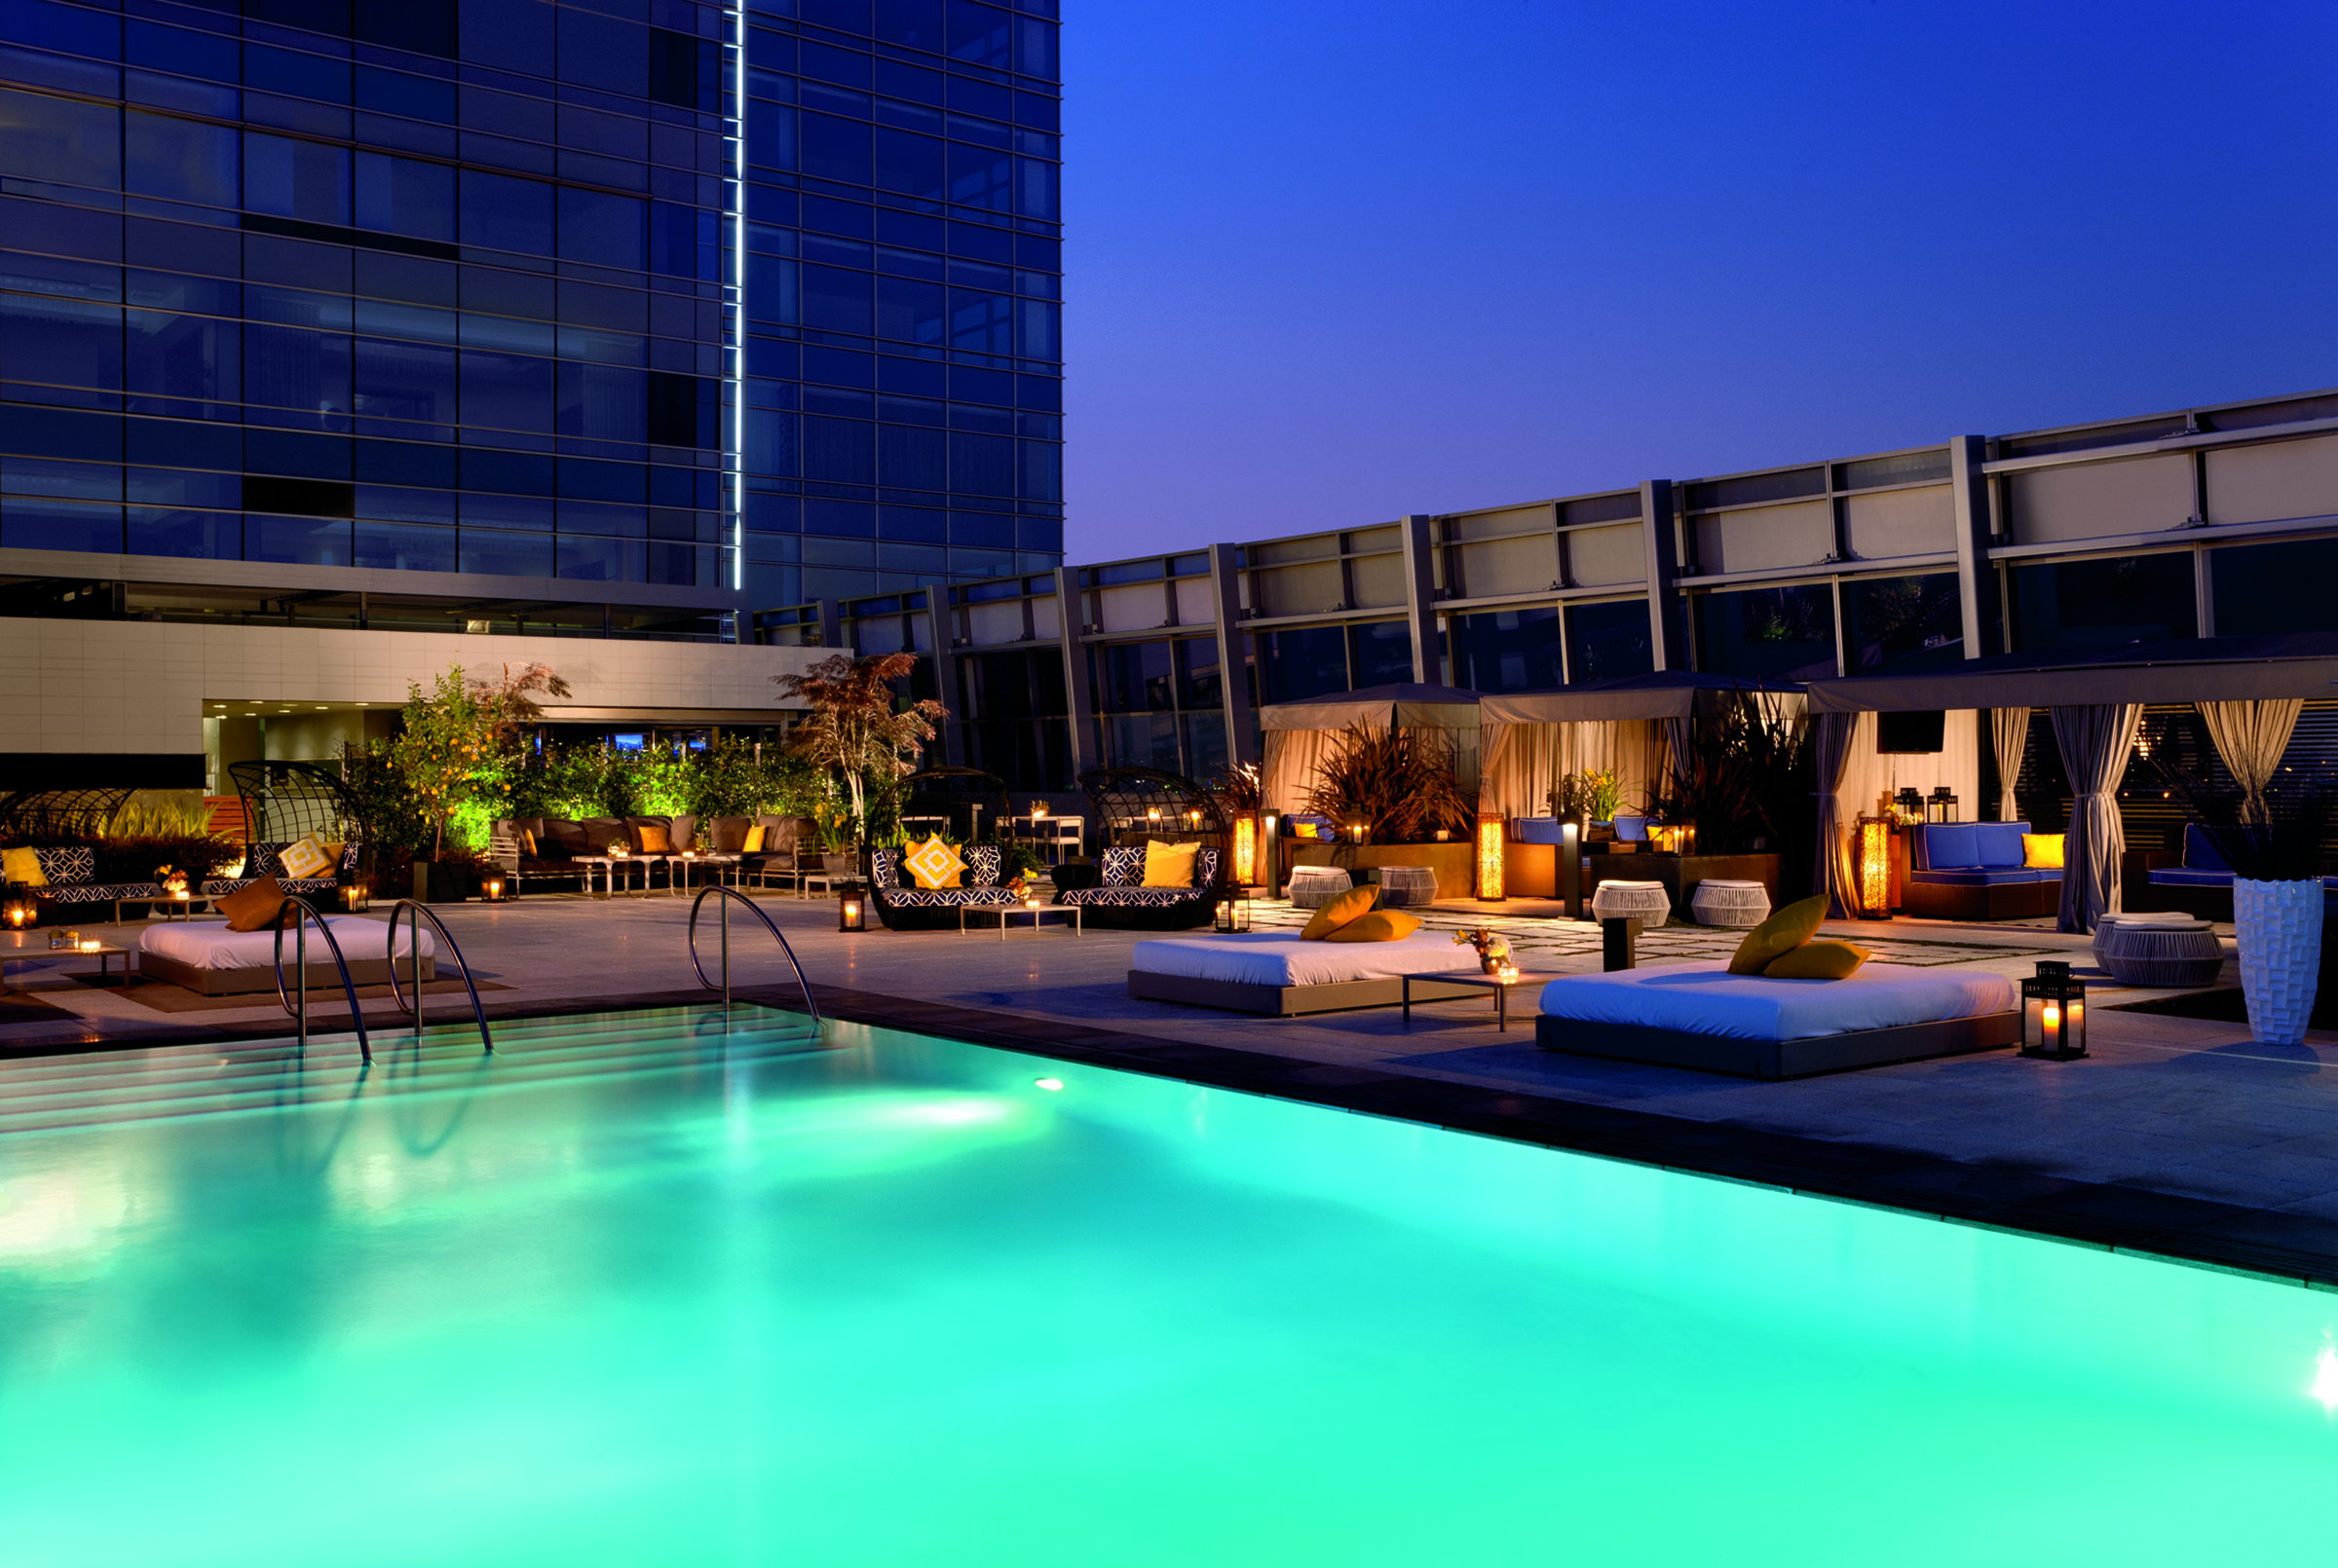 Ritz-Carlton Los Angeles California USA